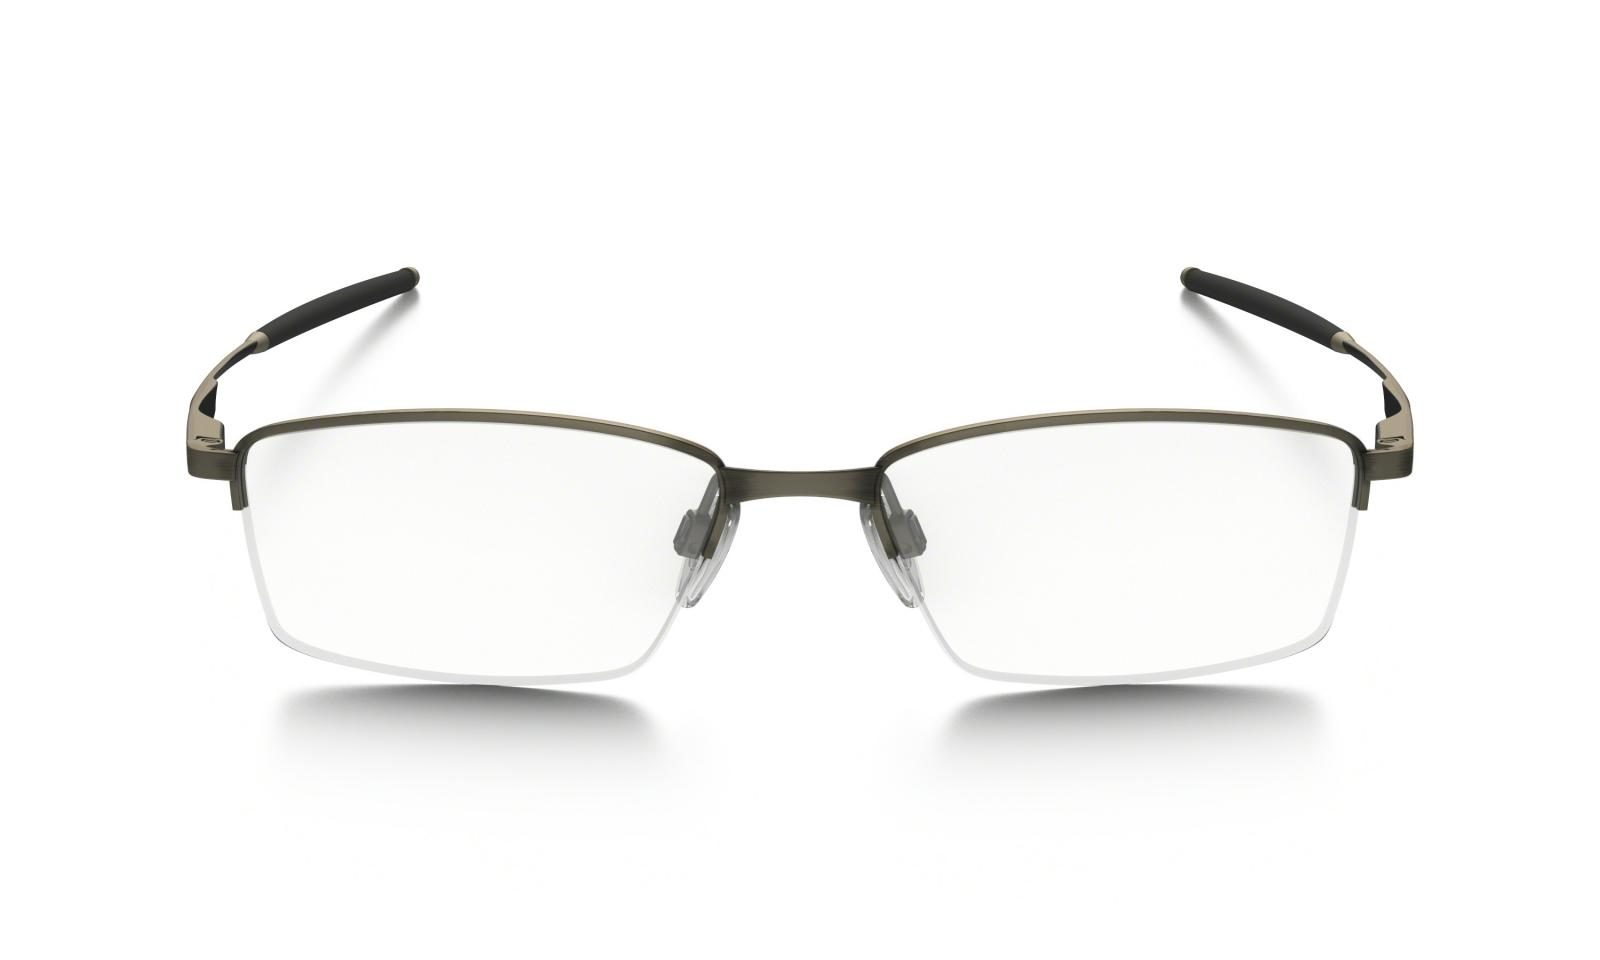 Oakley Limit Switch 0 5 Eyeglasses Frame Ox5119 0352 Color